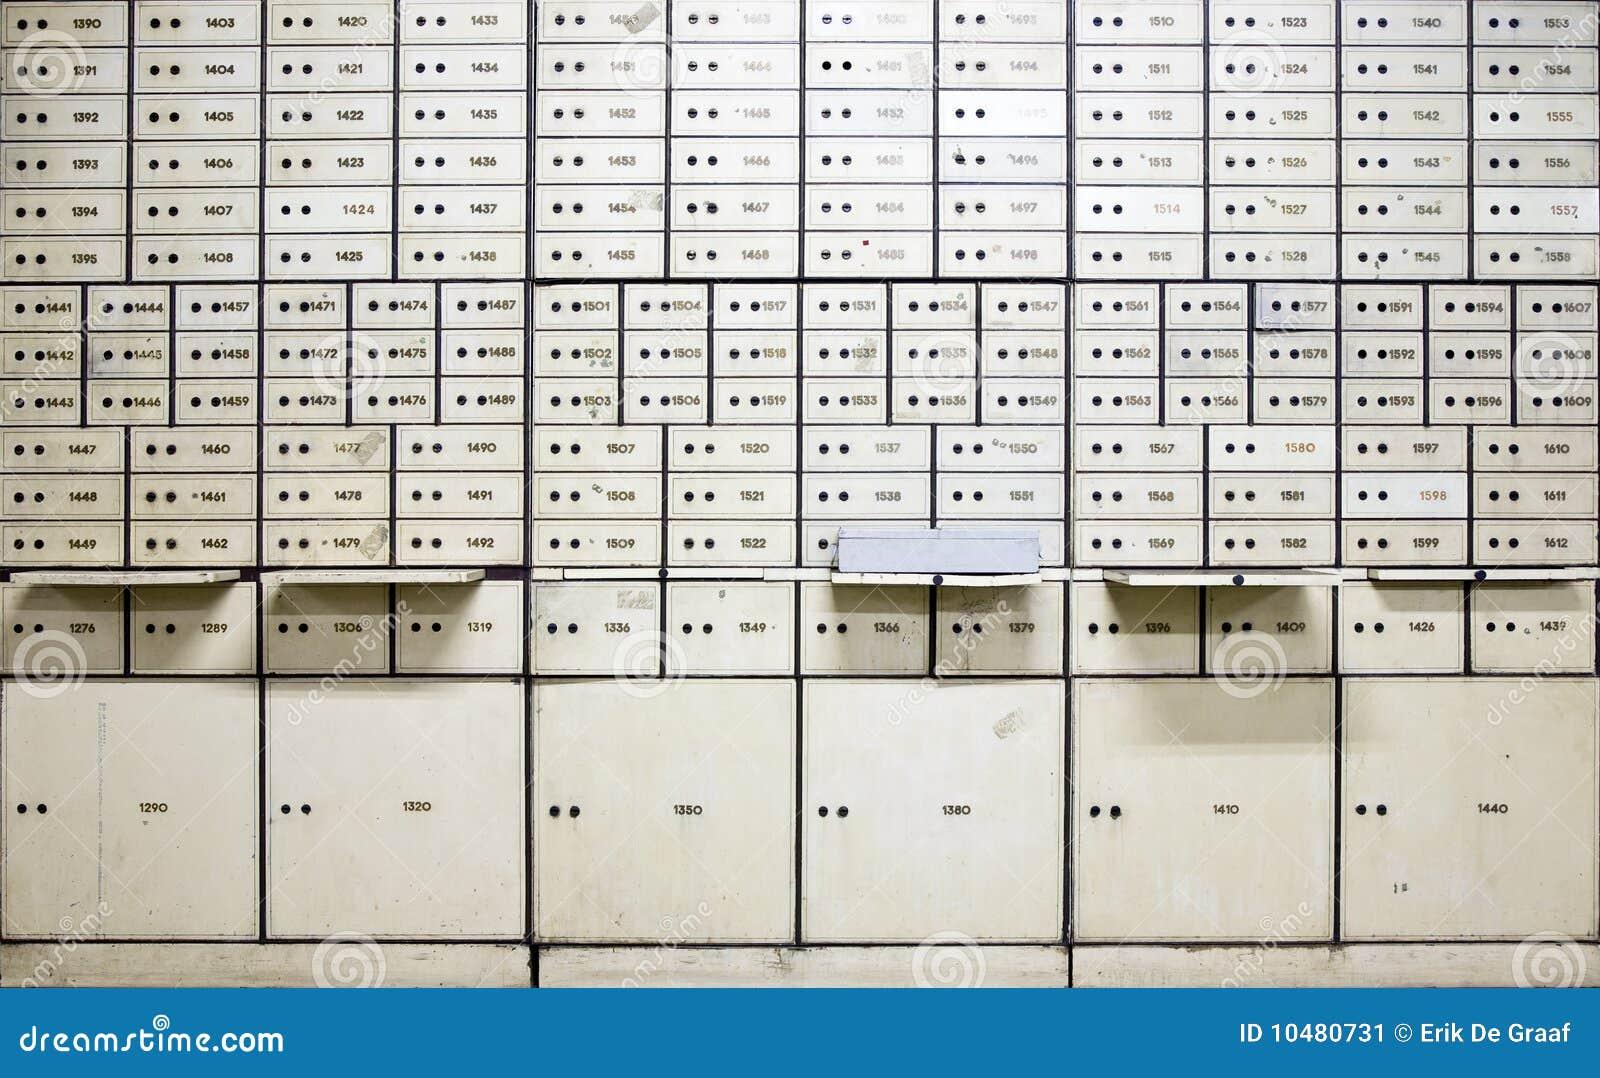 how to close a term deposit account bendigo bank